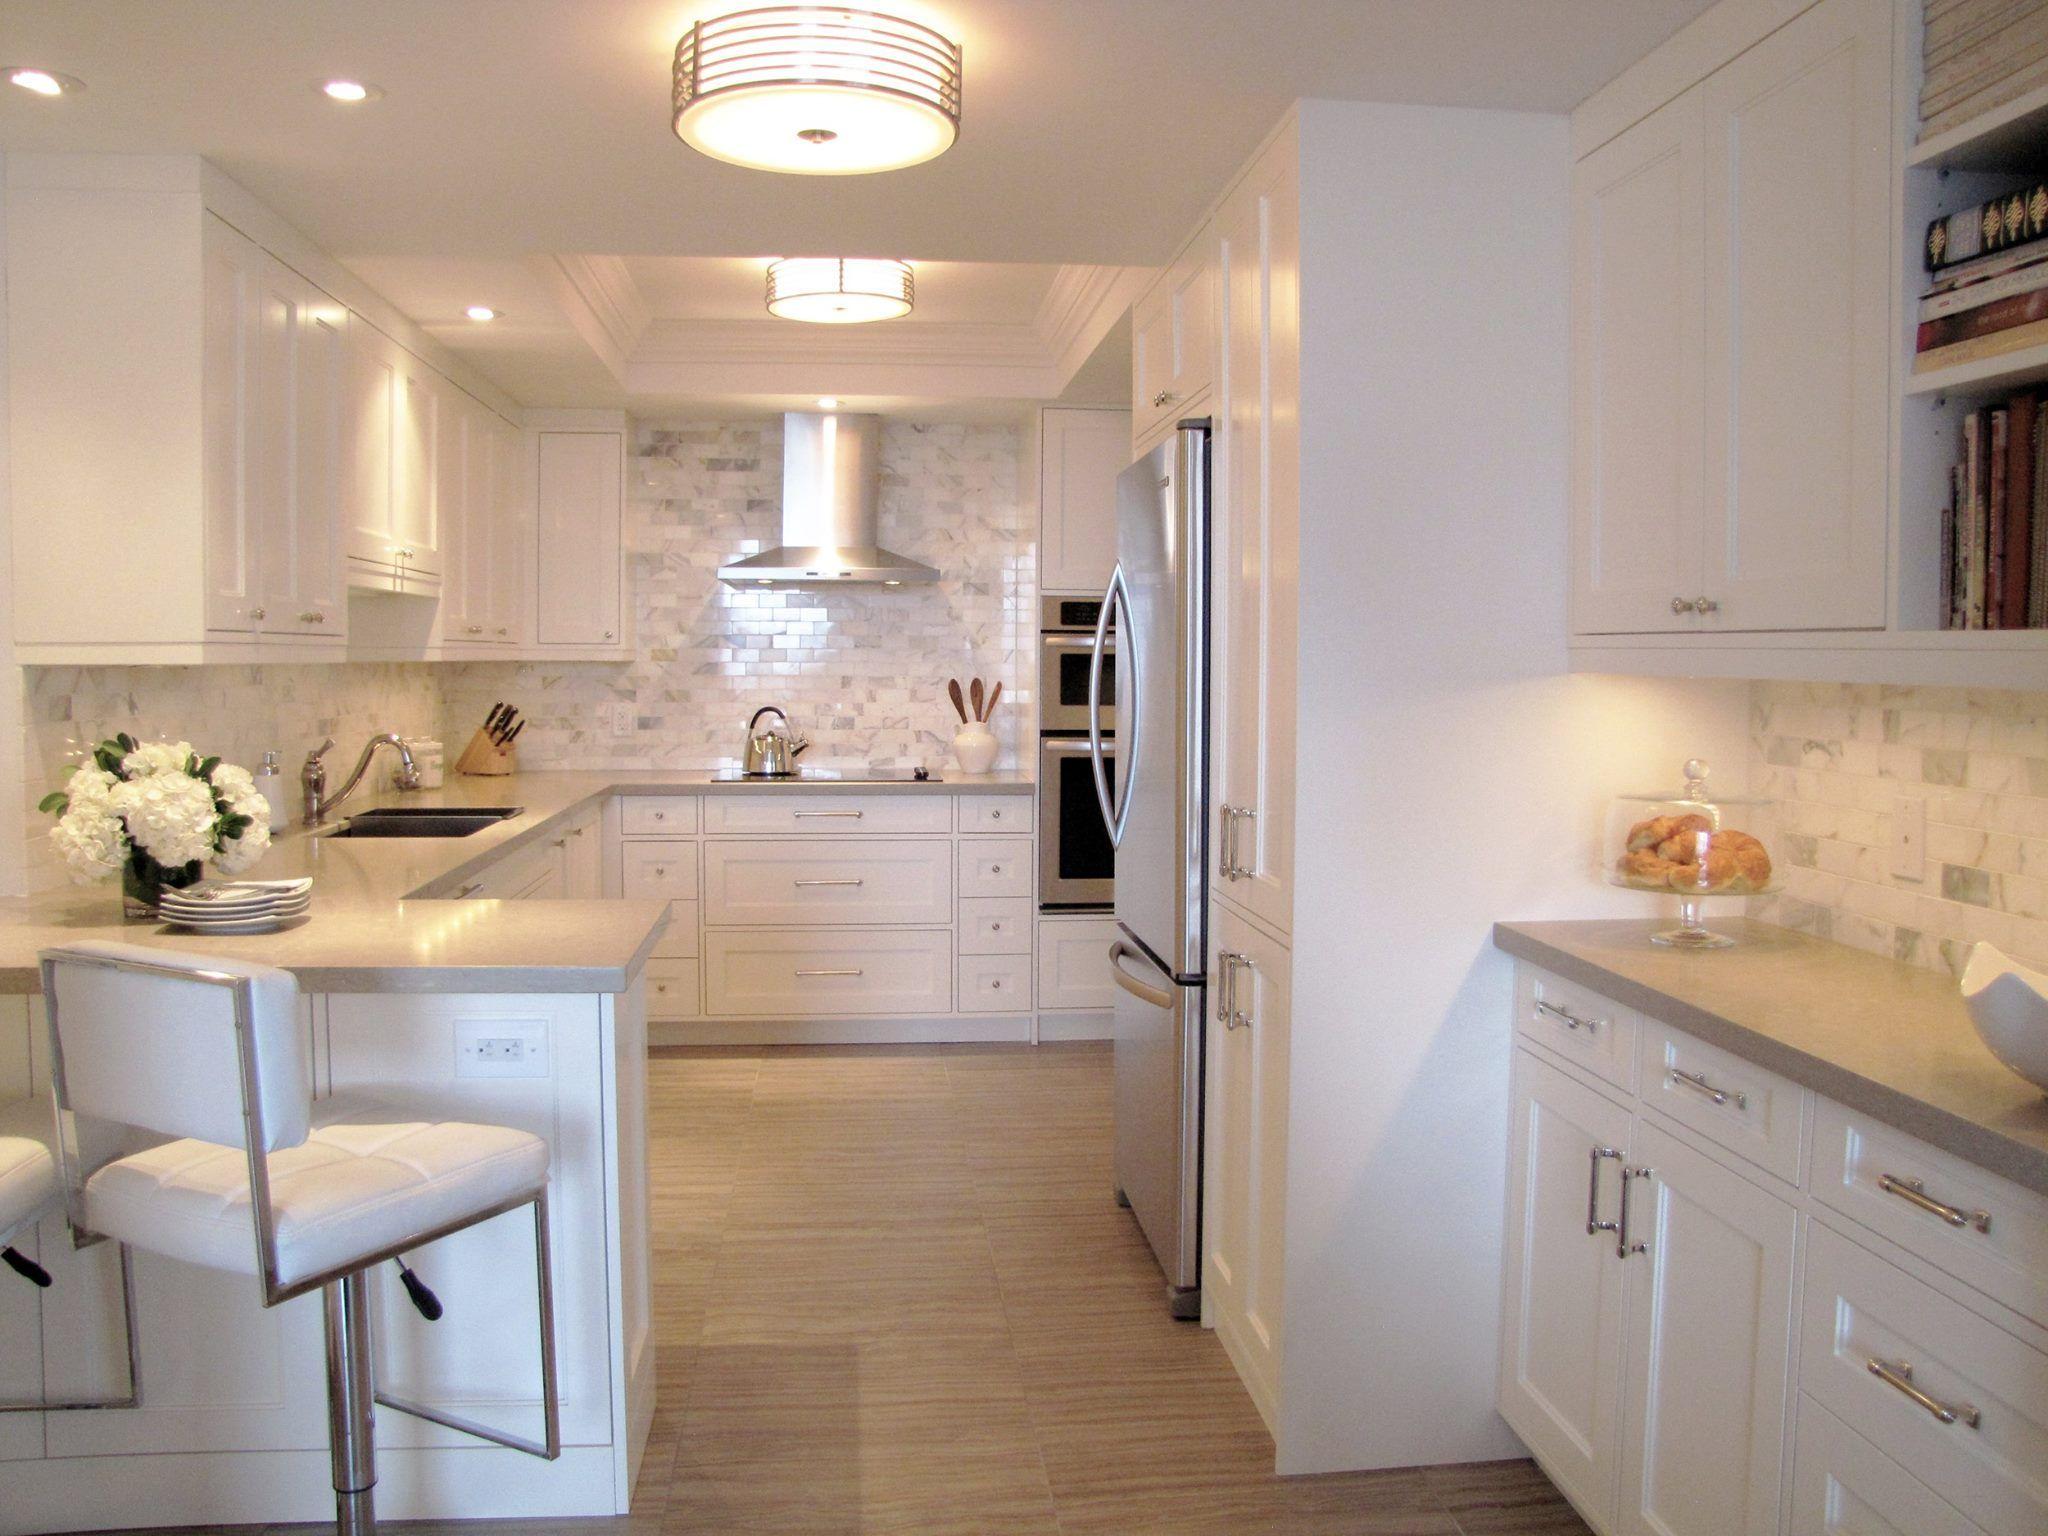 shitake countertops and marbled backsplash give this elegant white kitchen byu2026